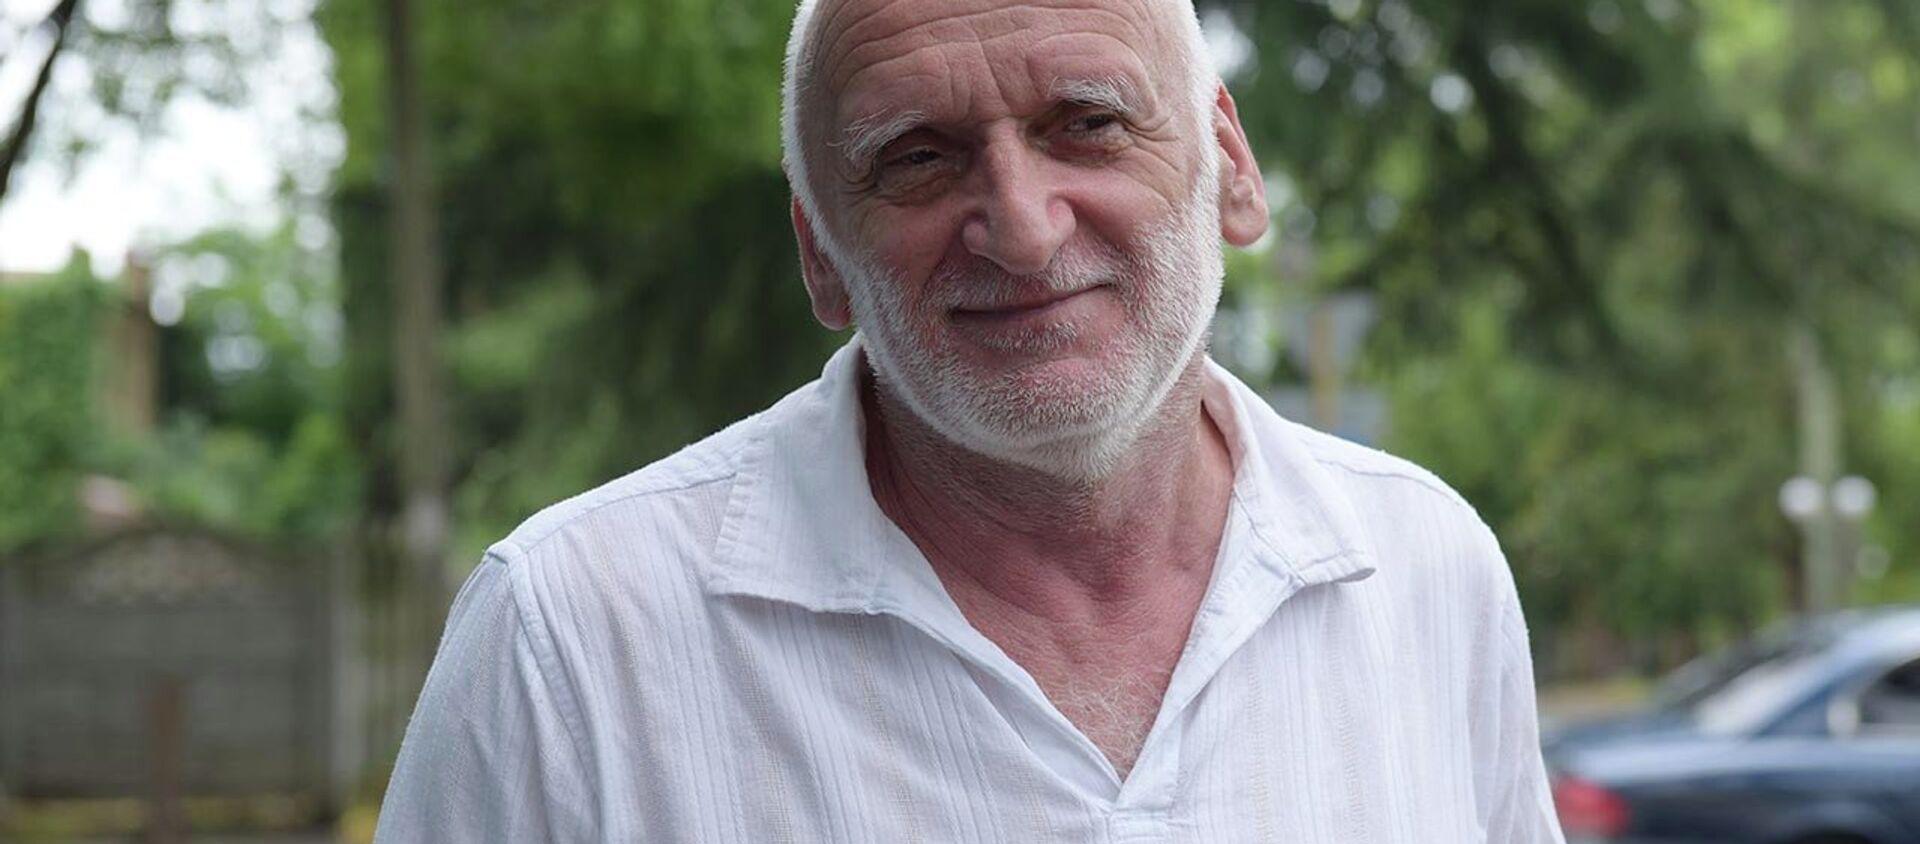 Актер Лаврик Ахба. - Sputnik Абхазия, 1920, 25.06.2015